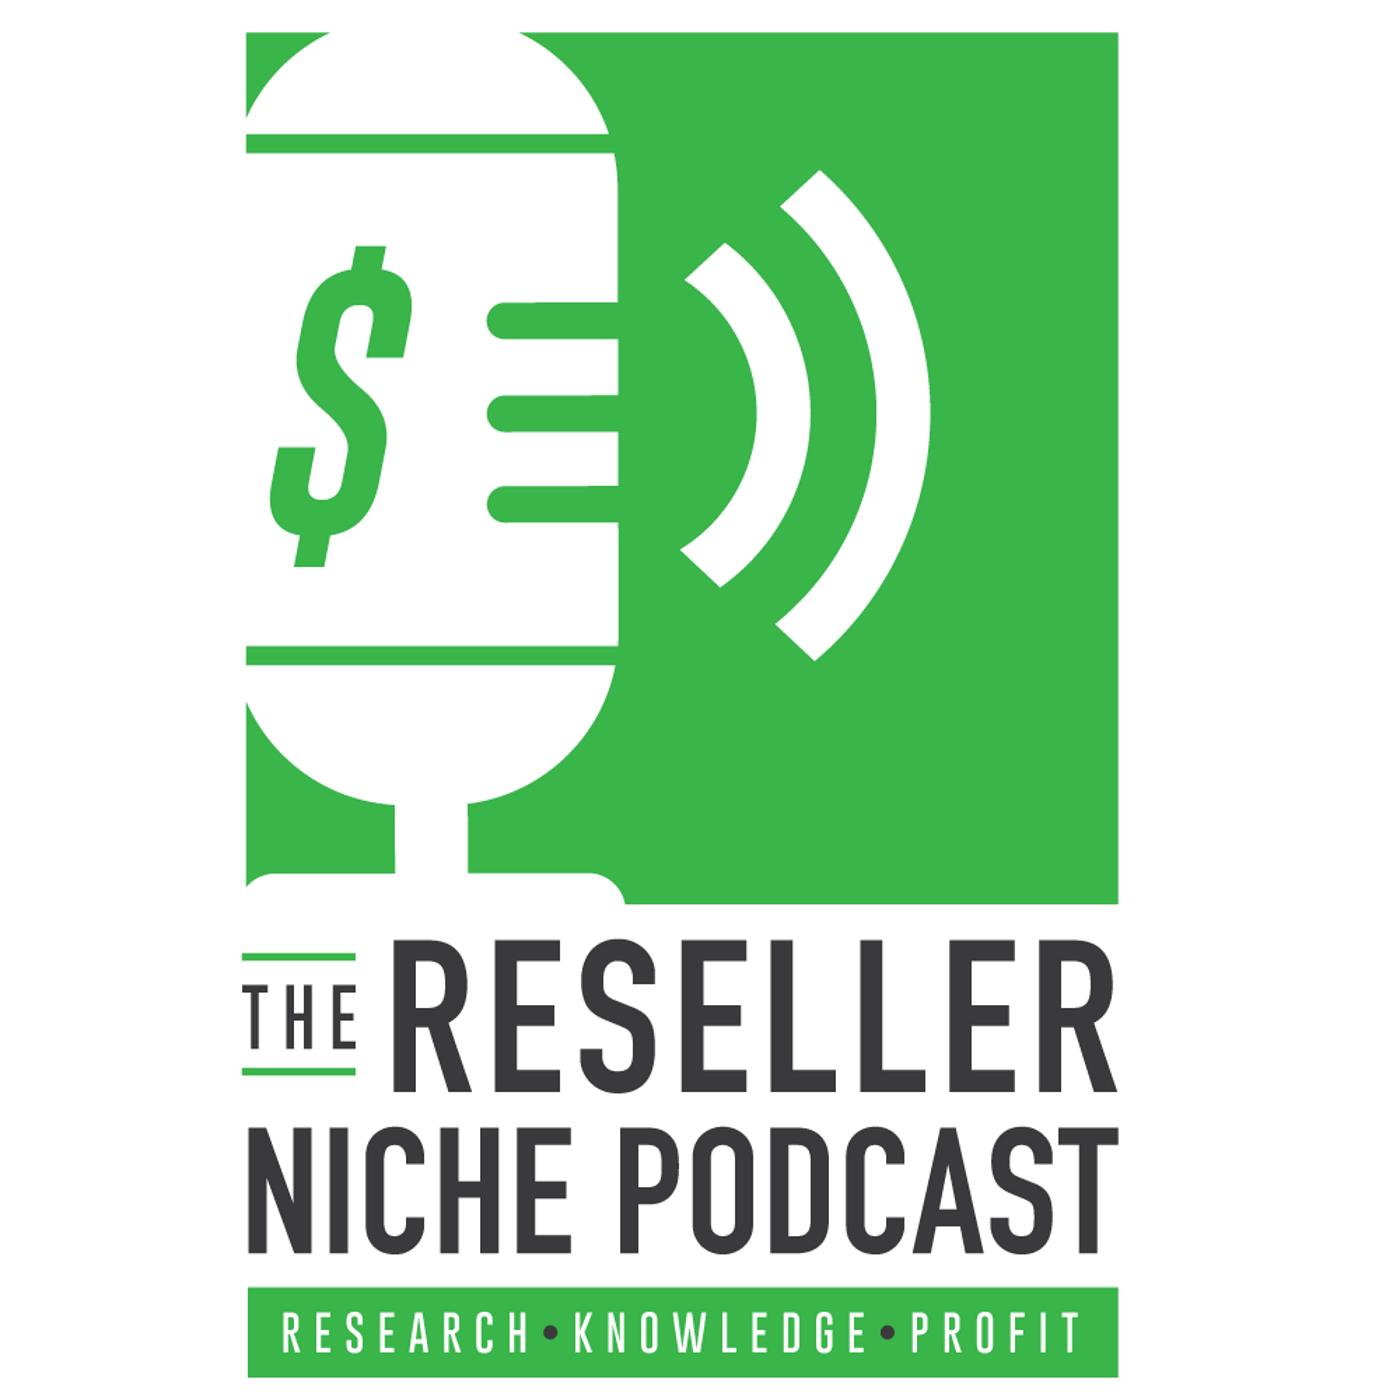 Reseller Niche Podcast show art